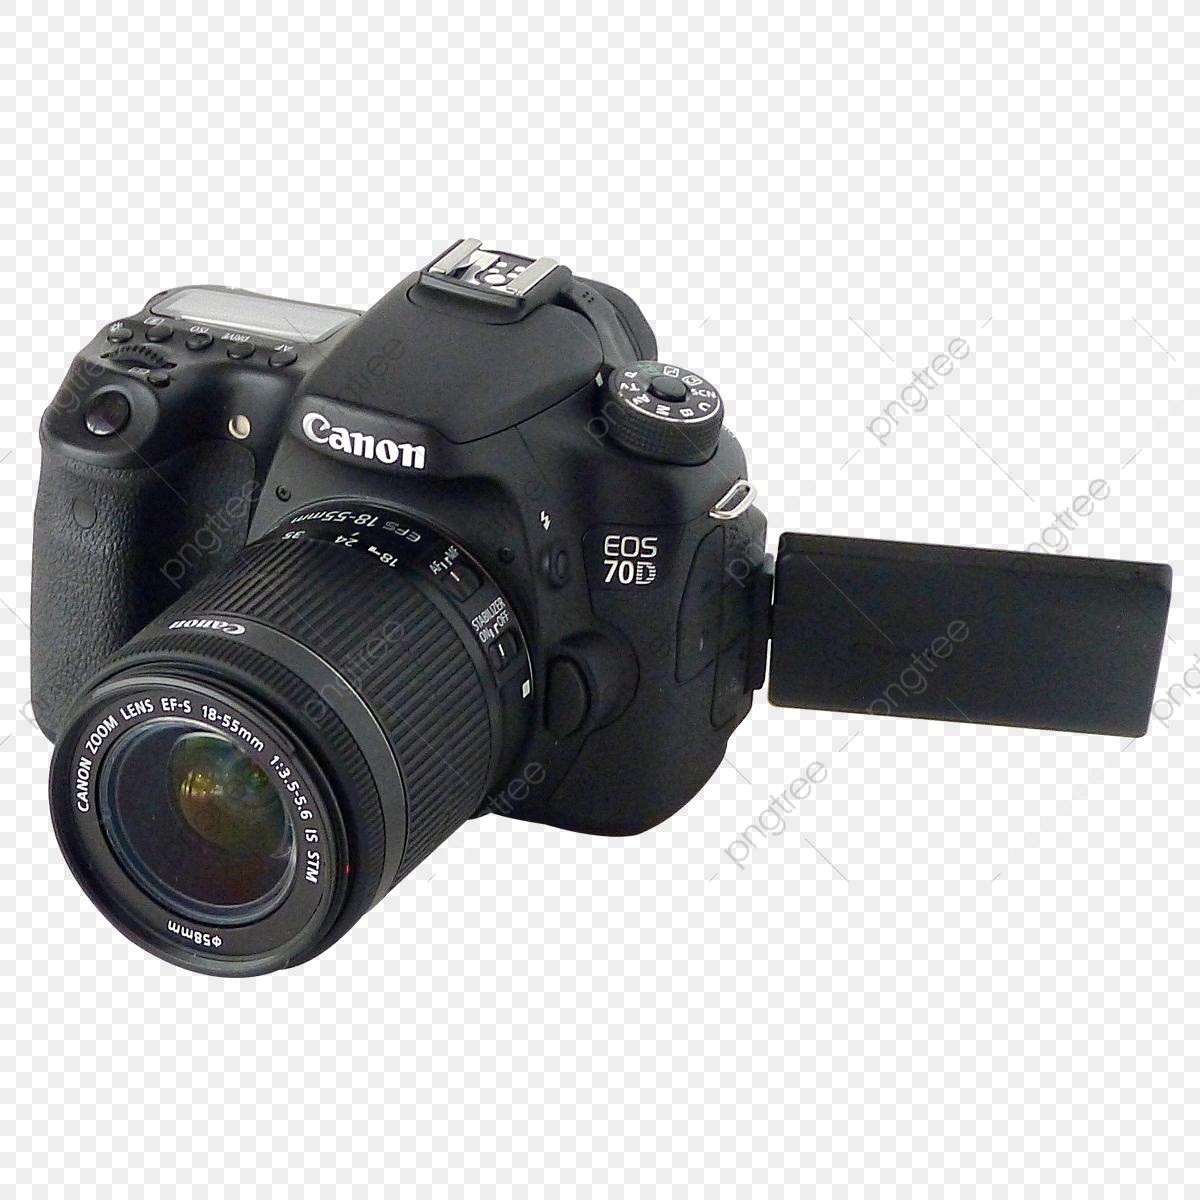 Dslr Camera, Png, Camera, Dslr PNG Transparent Clipart Image and PSD.